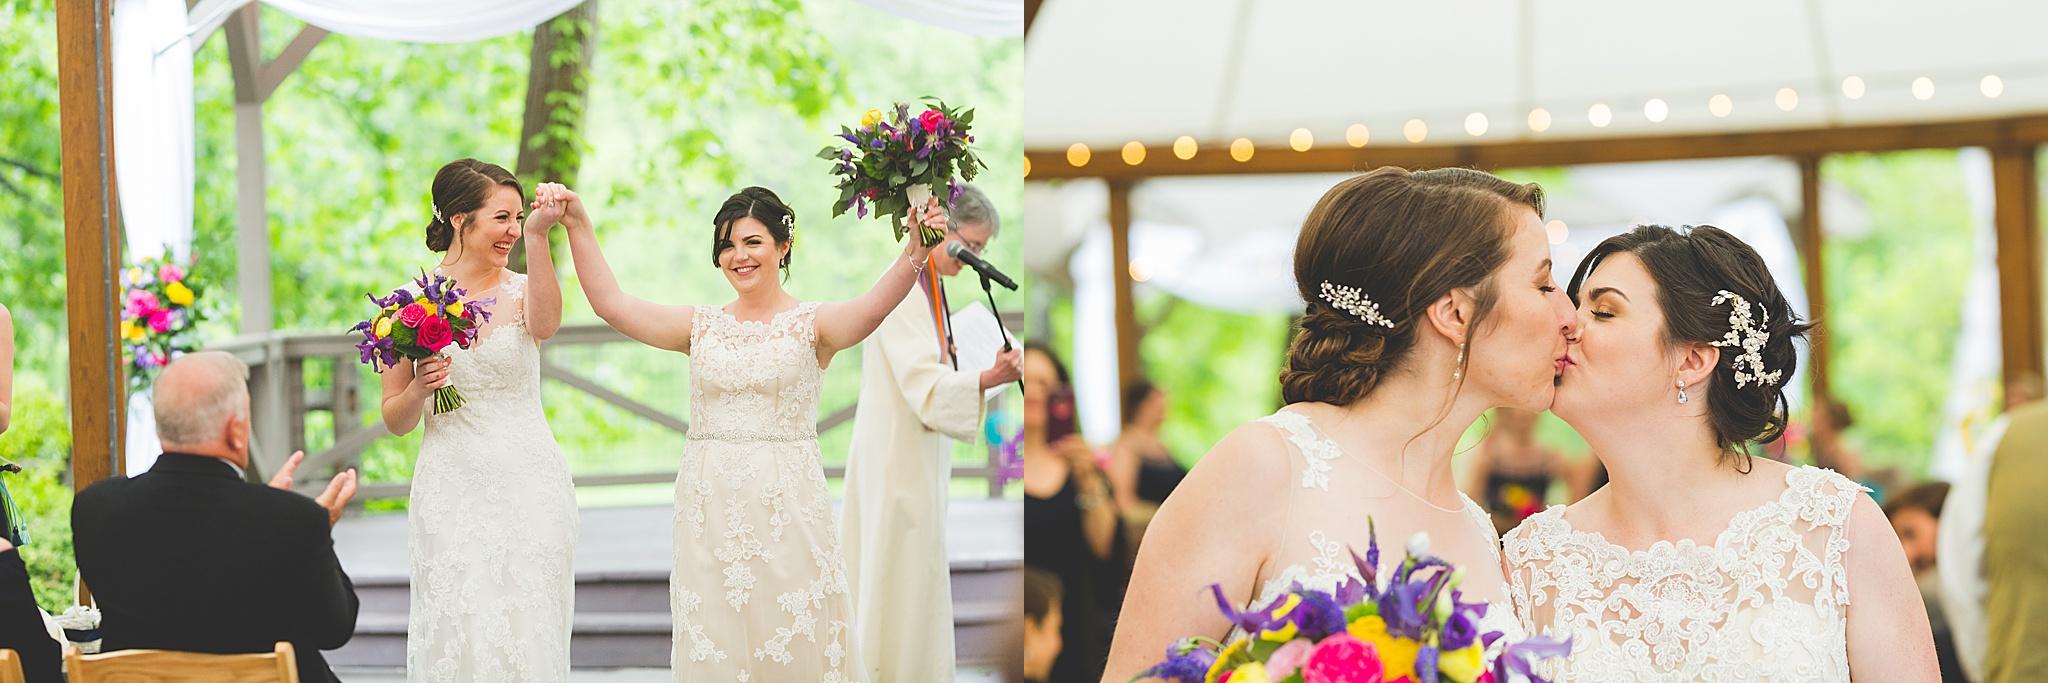 Albany_Wedding_Photographer_7376.jpg